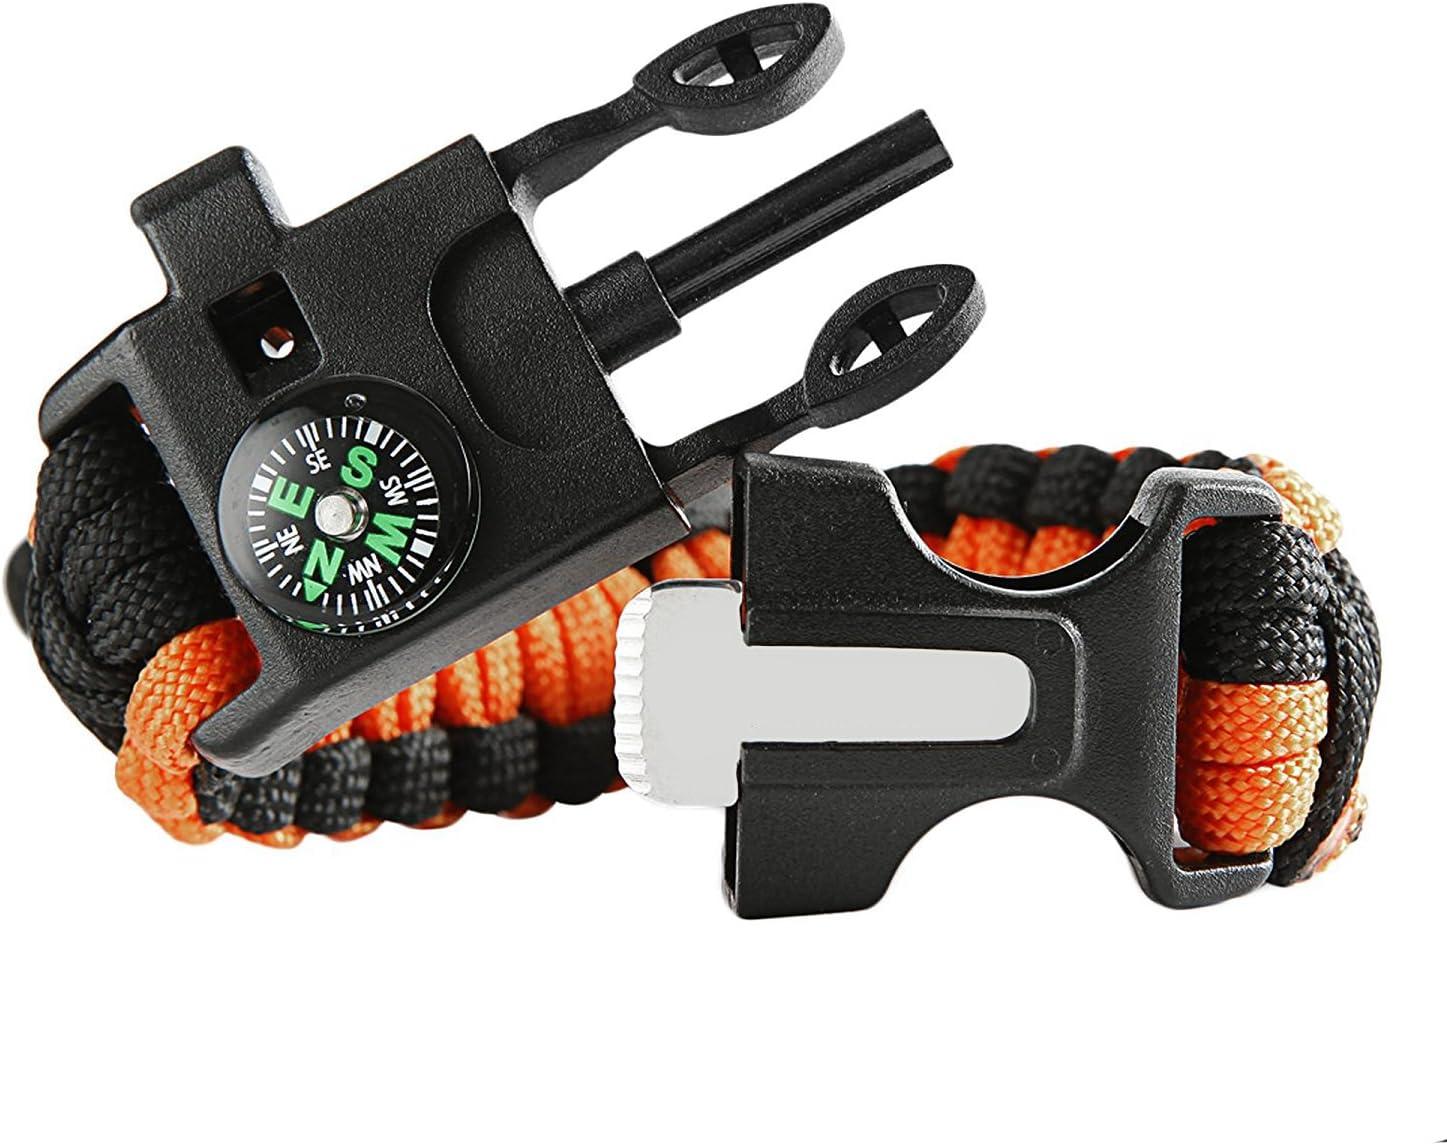 Multifunctional Paracord Survival Bracelets Kits with Compass Whistle Fire Starter Flintstone Hiking Camping Emergency Scraper Survival Bracelet Buckles Tool